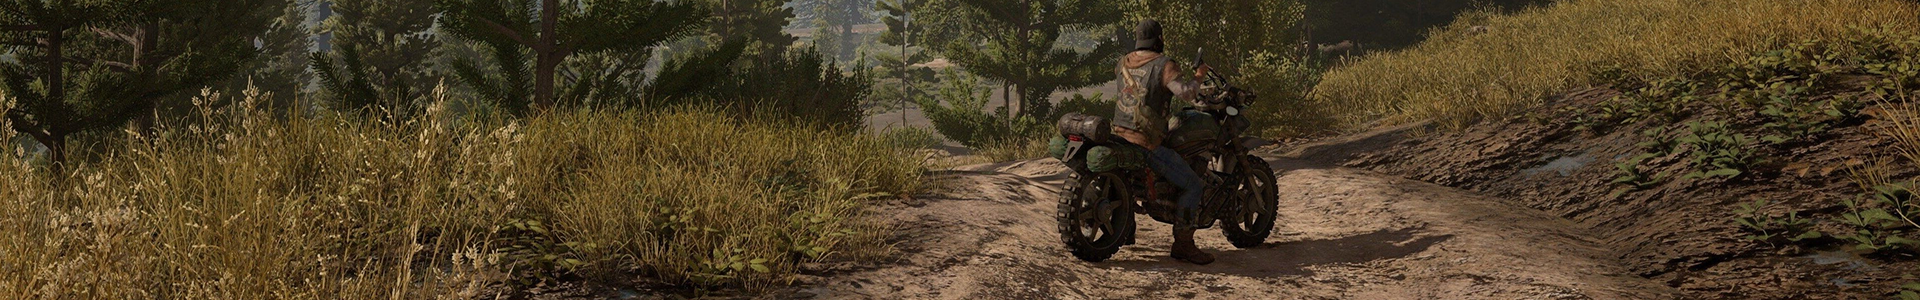 Banner media of Days Gone video game.